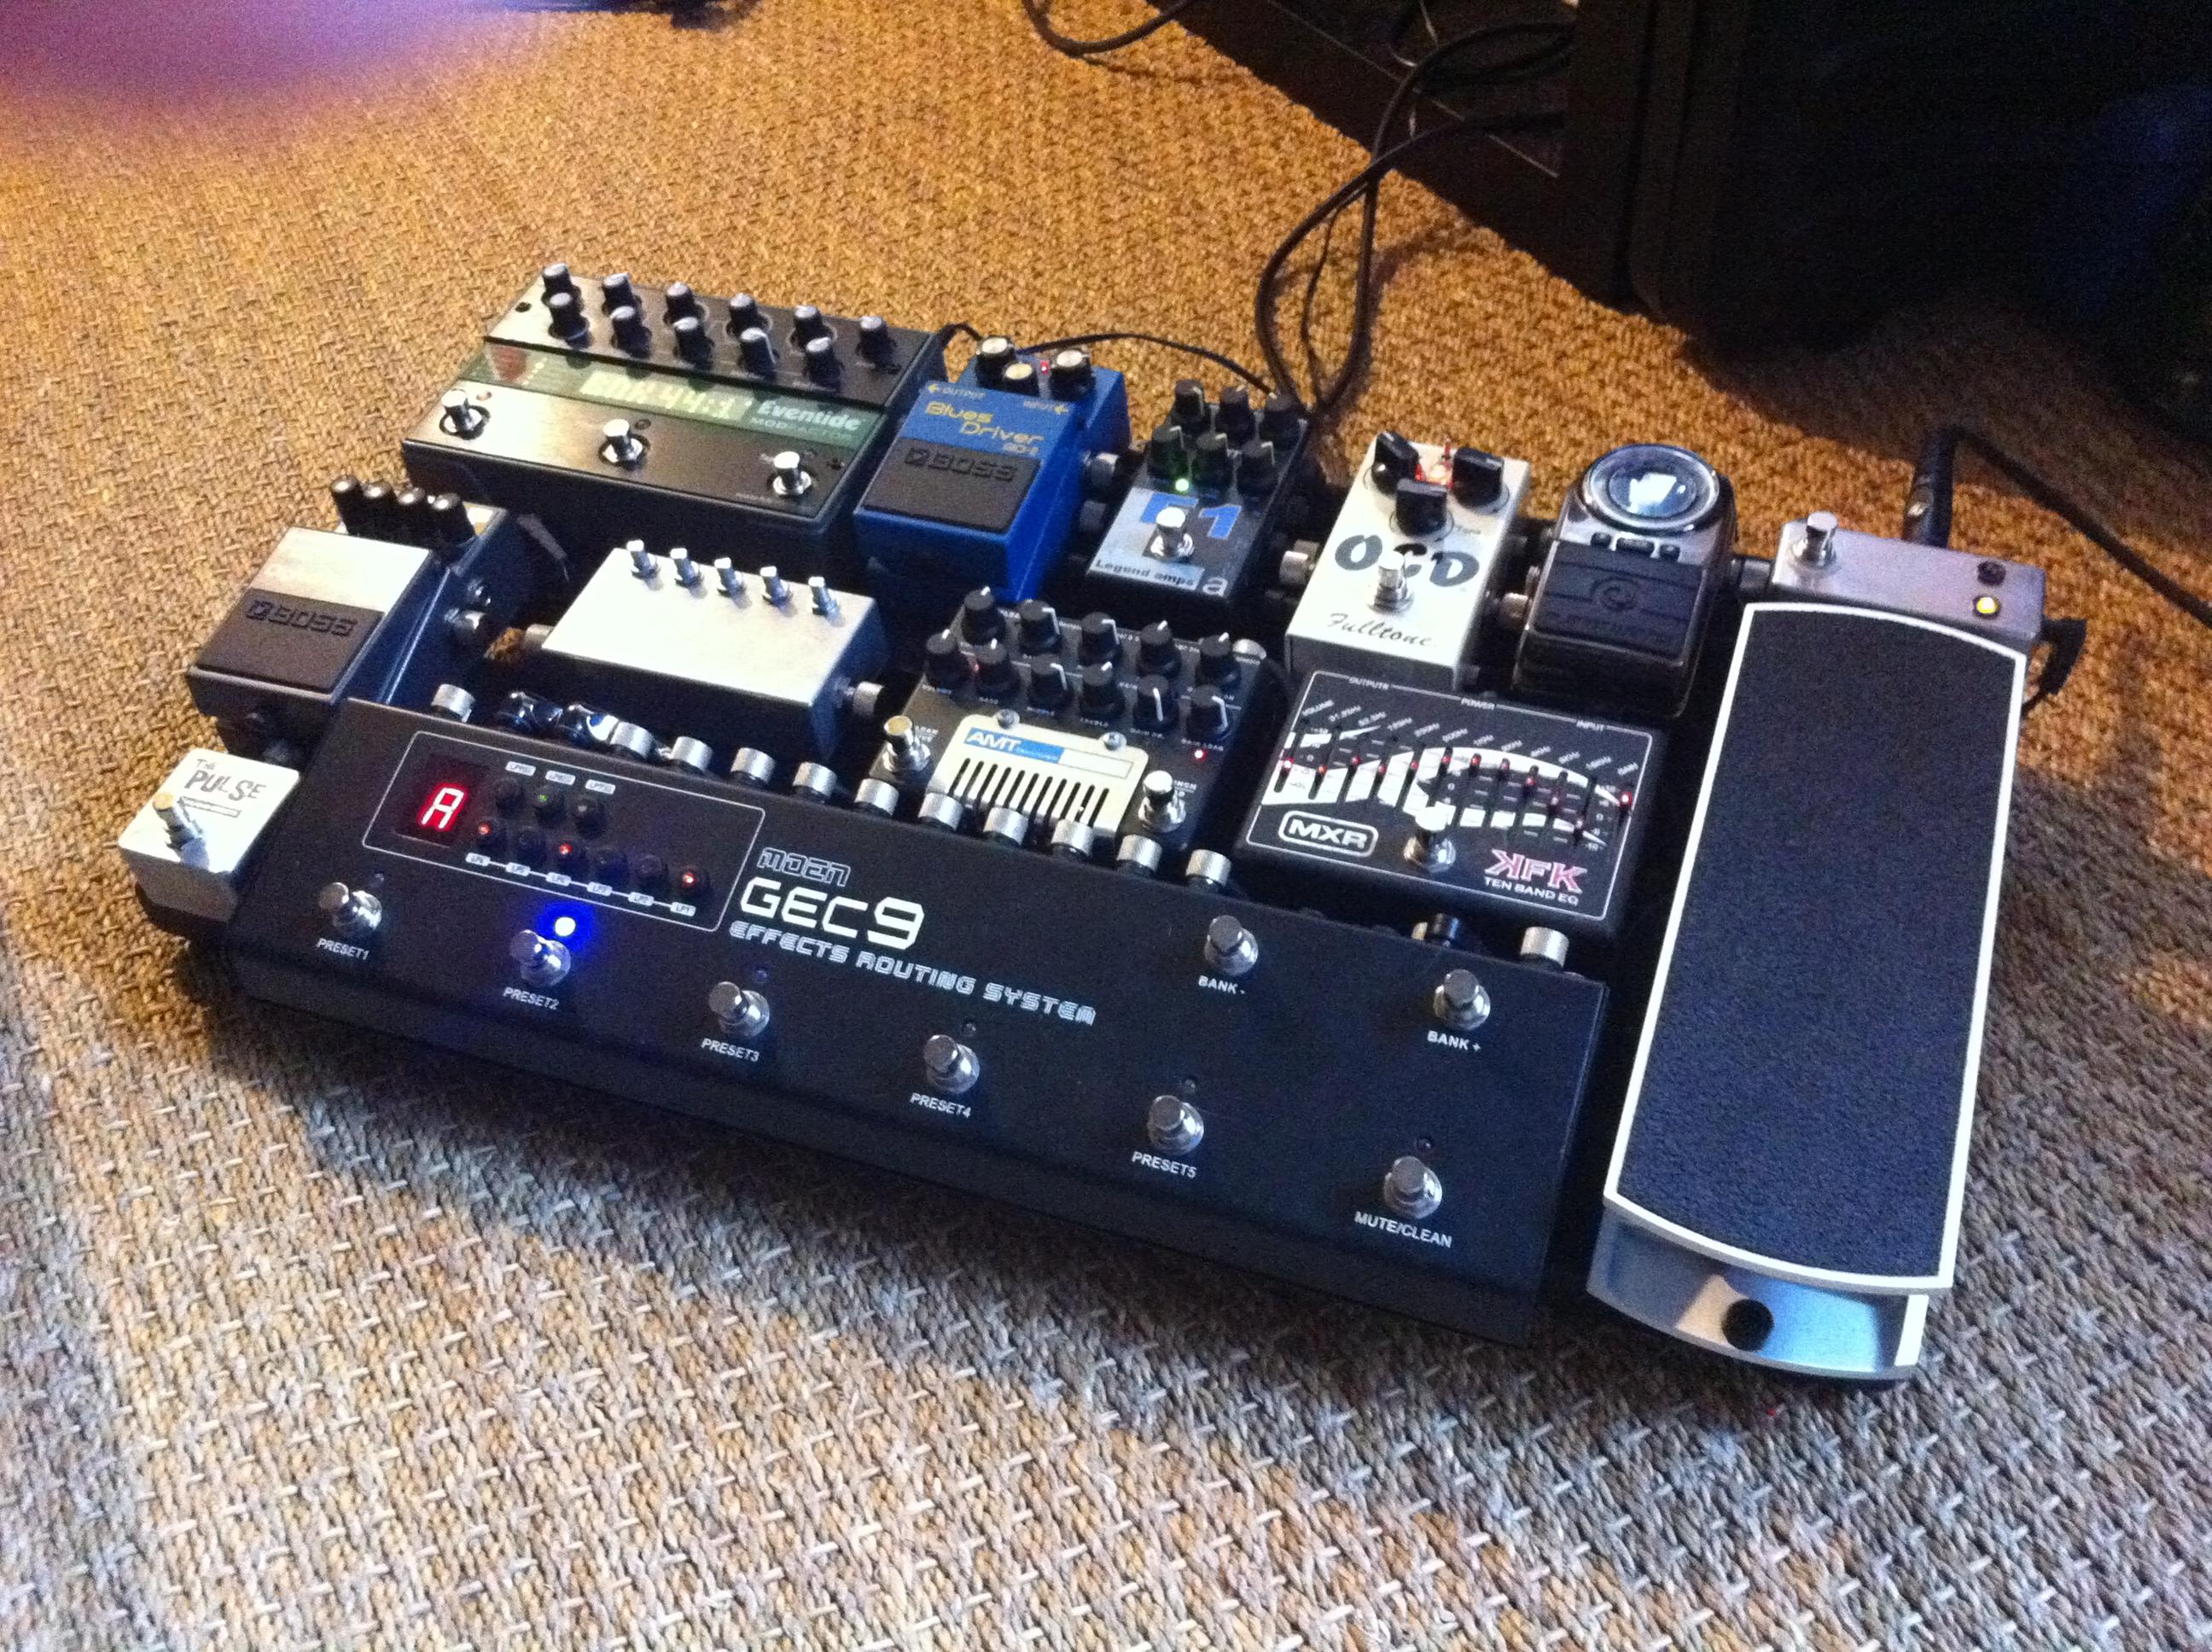 moen gec9 guitar effect controller image 326480 audiofanzine. Black Bedroom Furniture Sets. Home Design Ideas